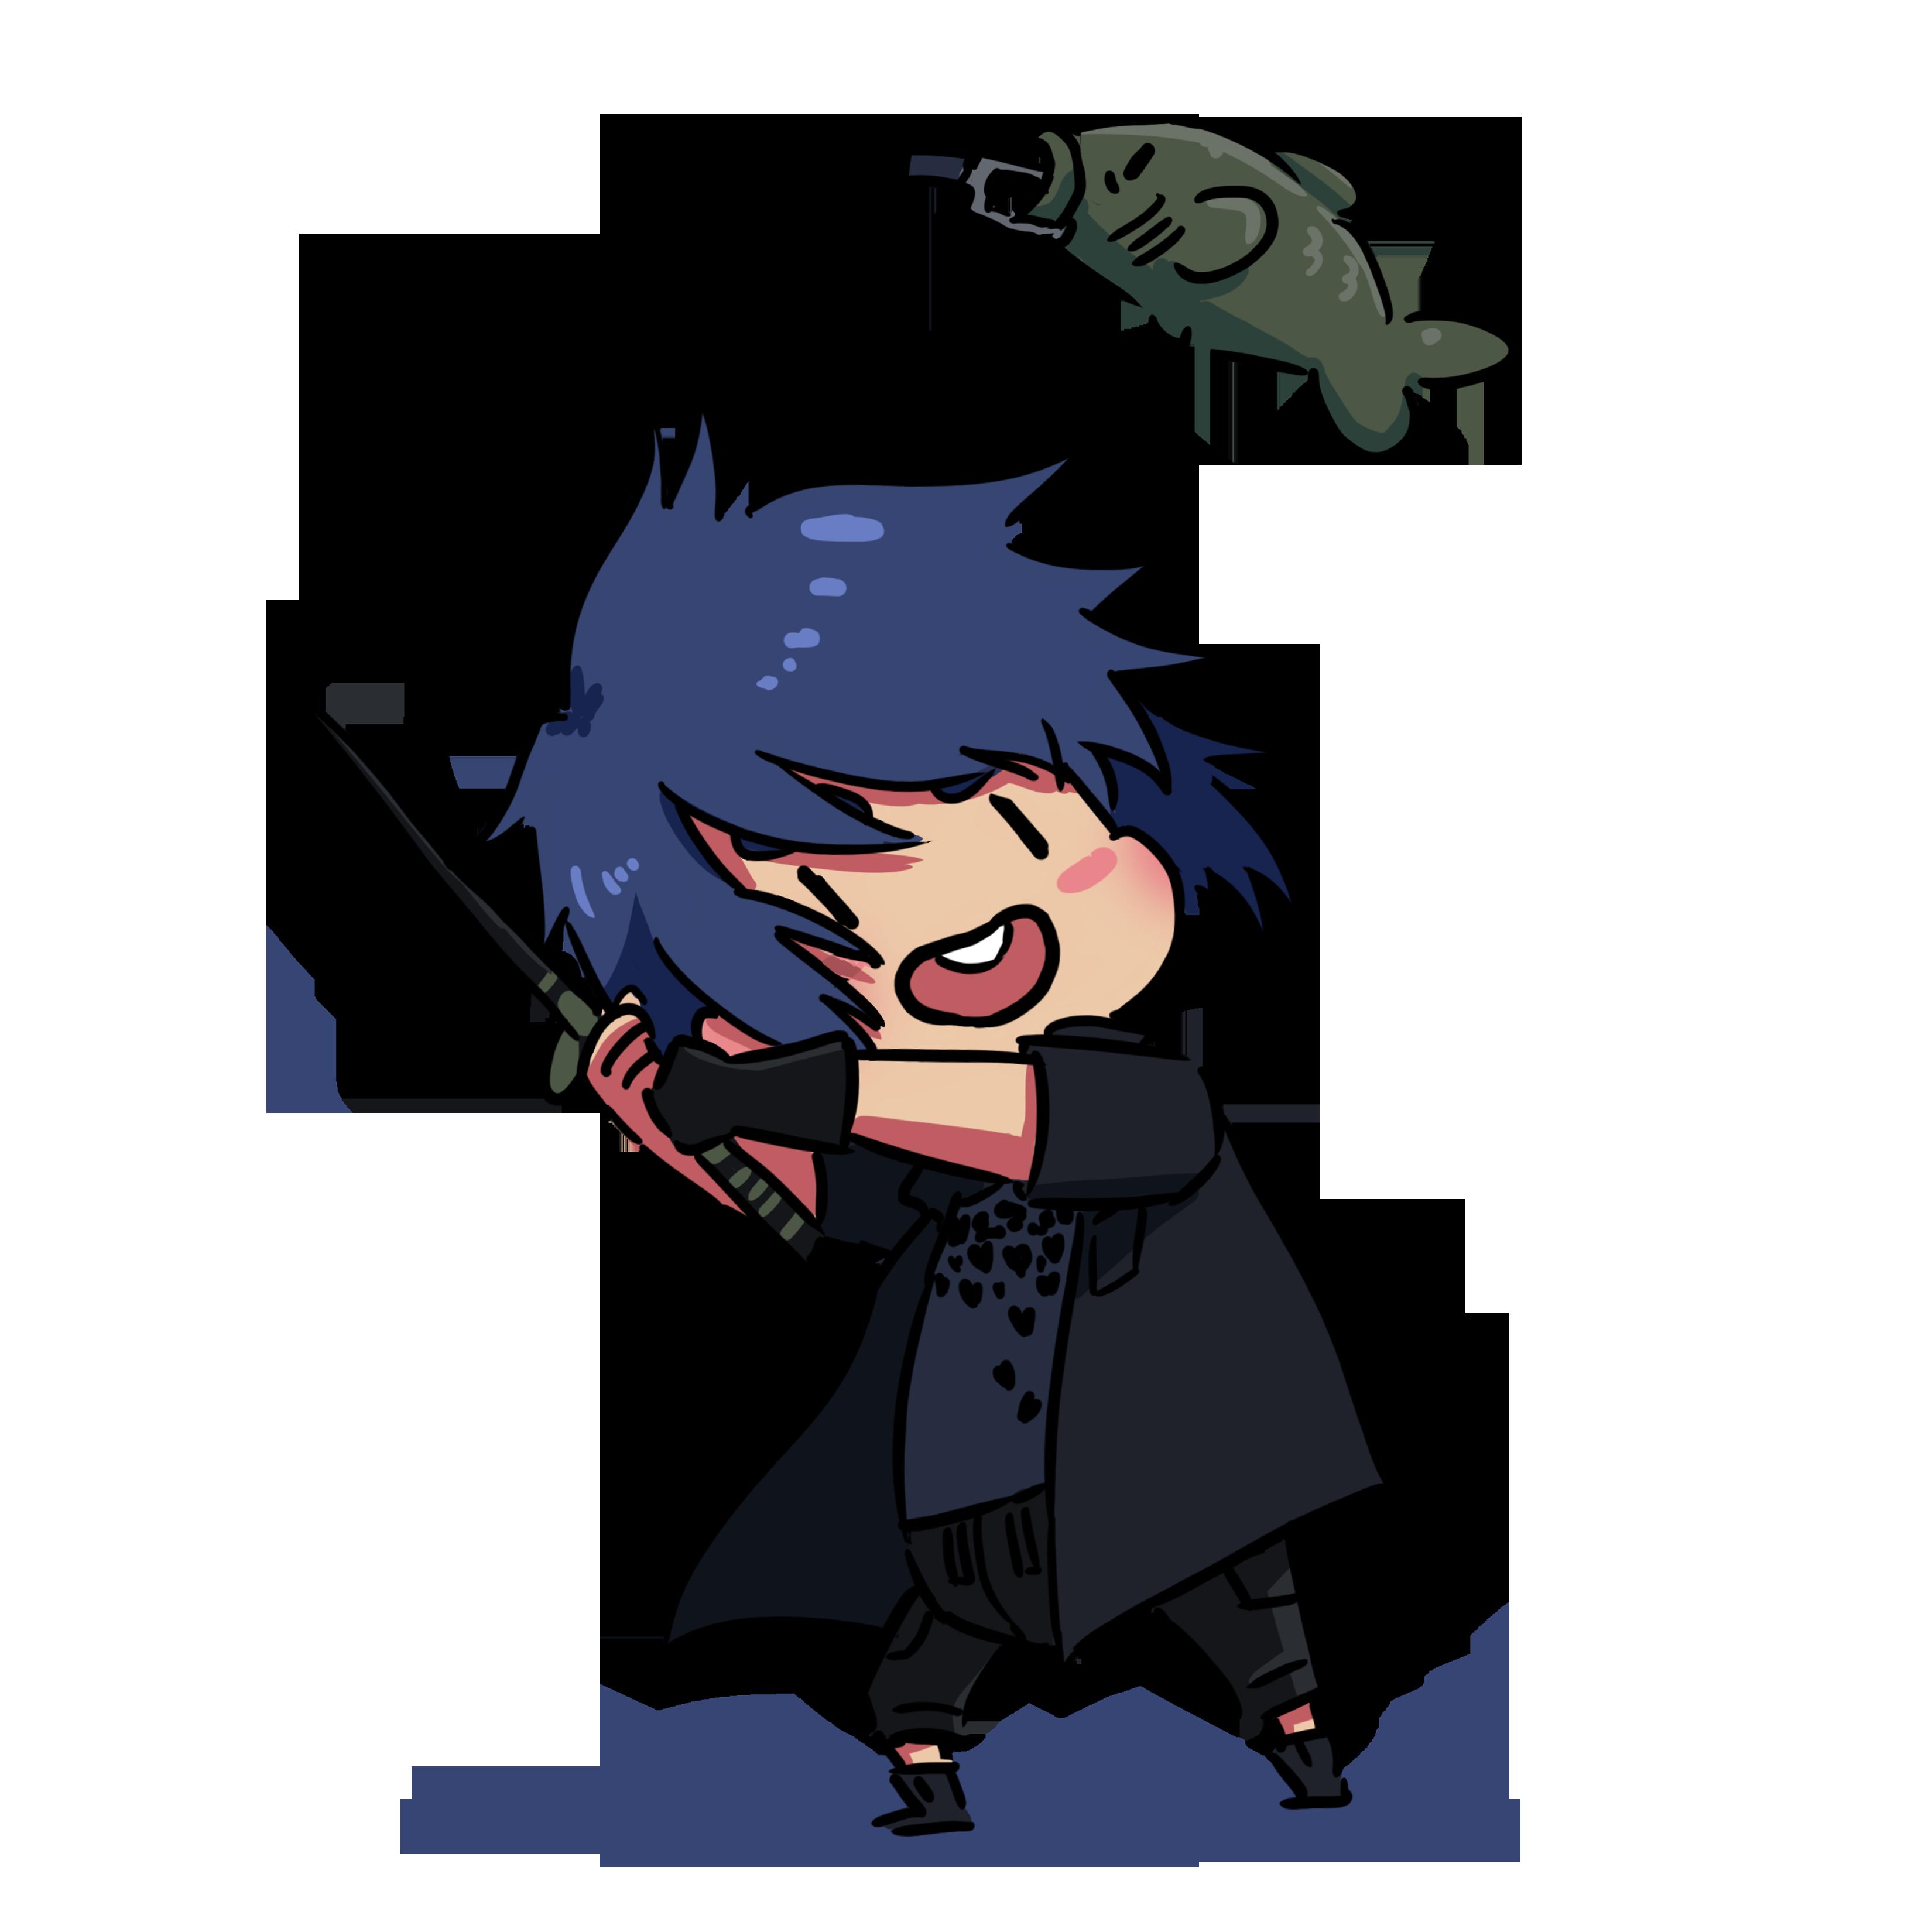 Chibi noctis fishing final fantasy xv fan art for Final fantasy 15 fishing